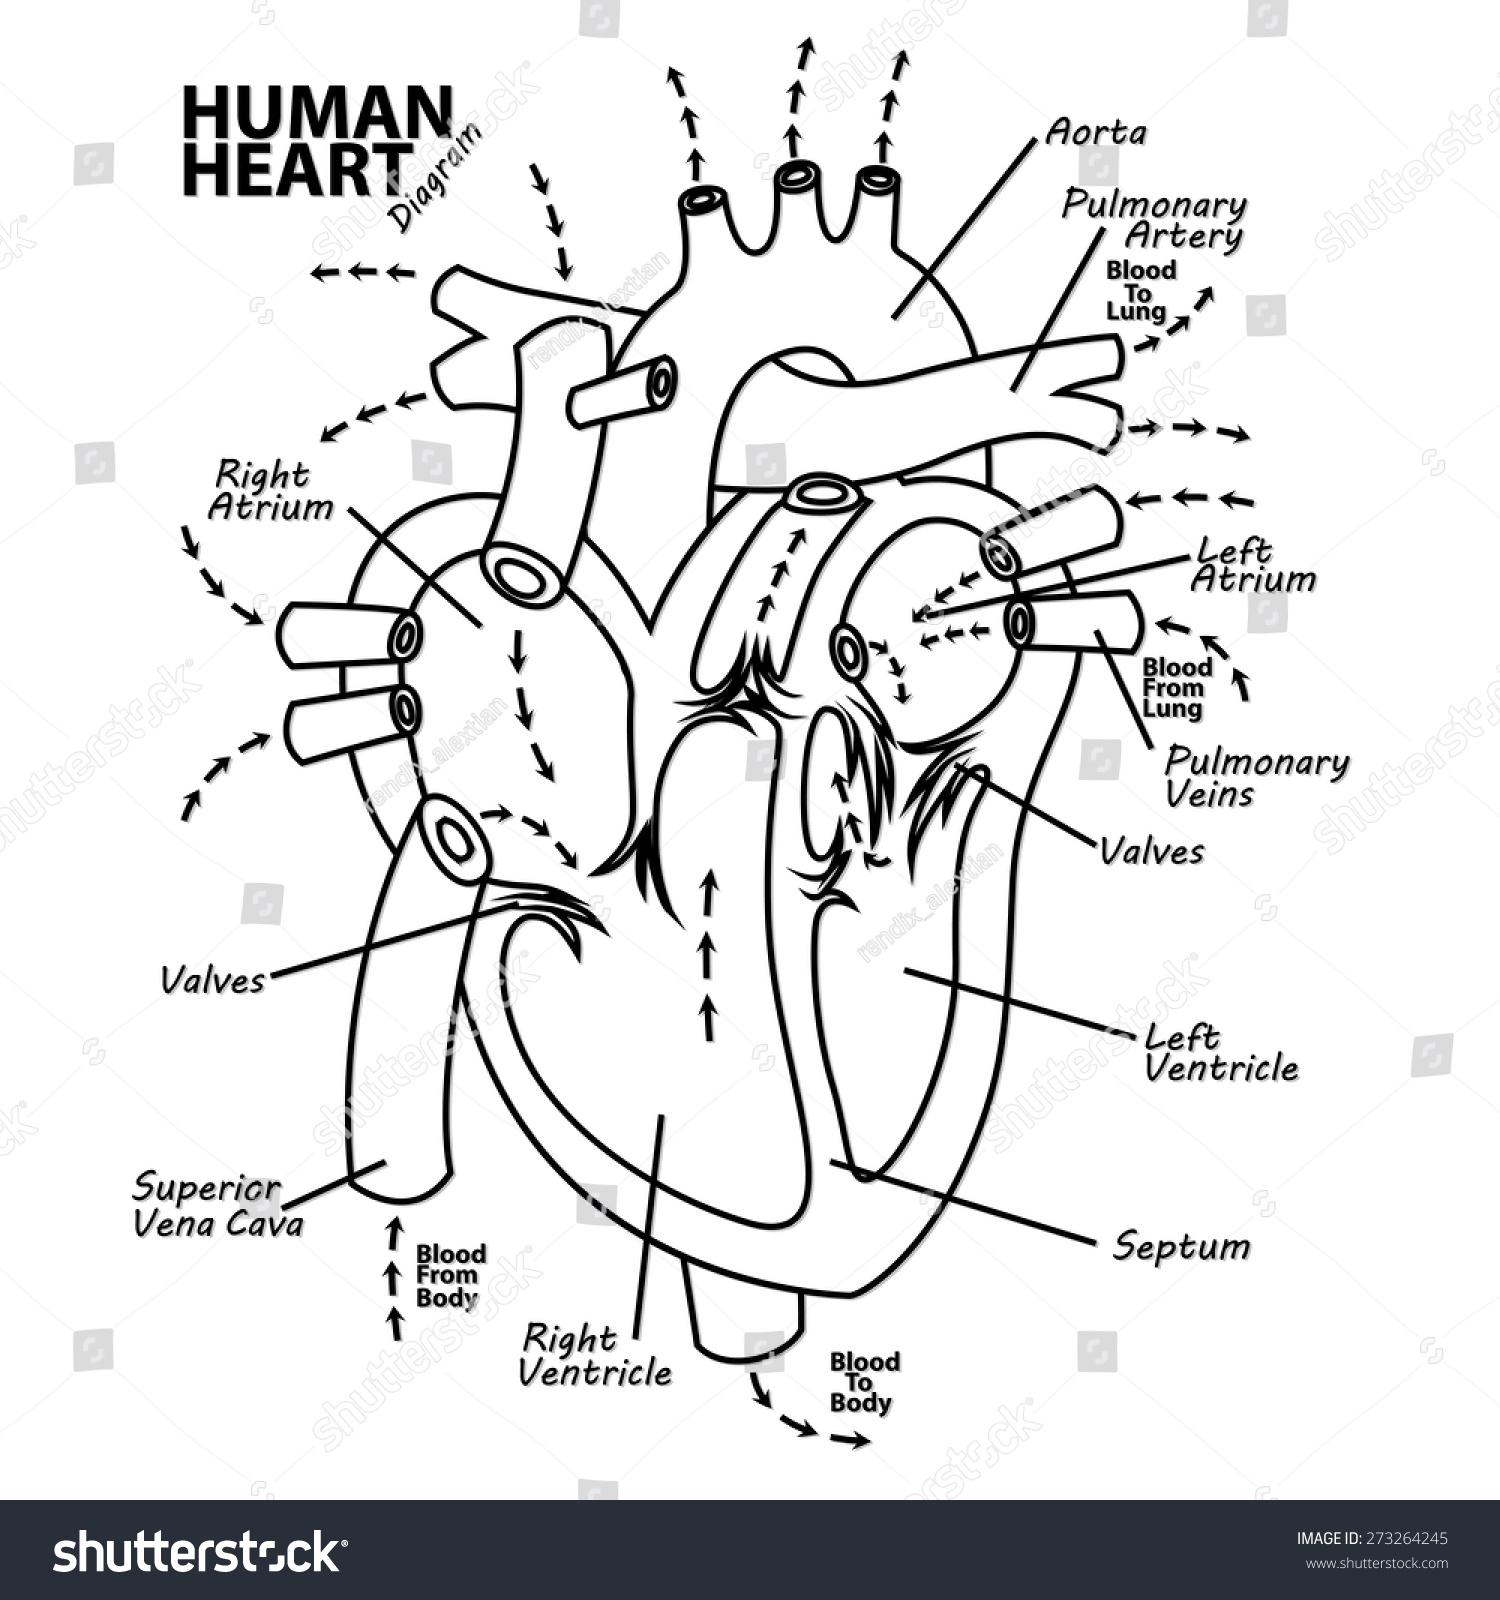 Human Heart Diagram Anatomy Stock Vector